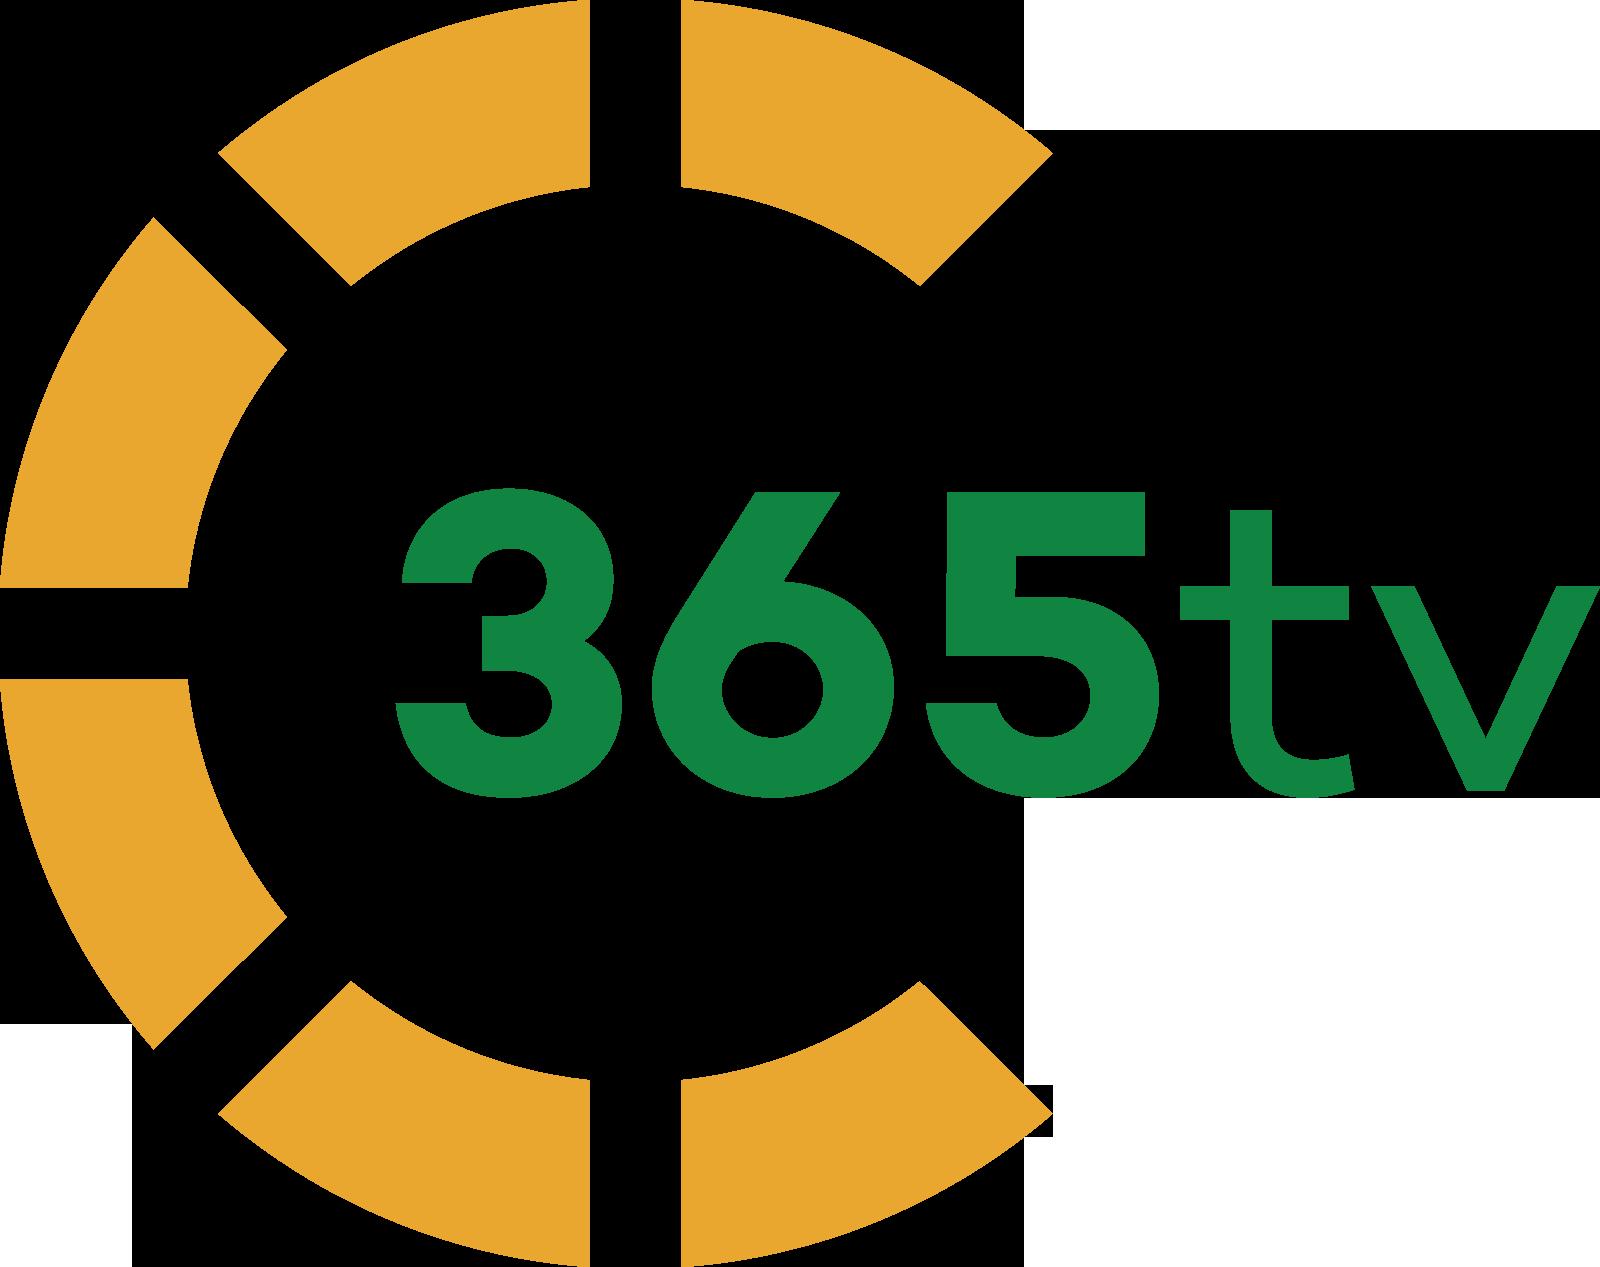 365internet